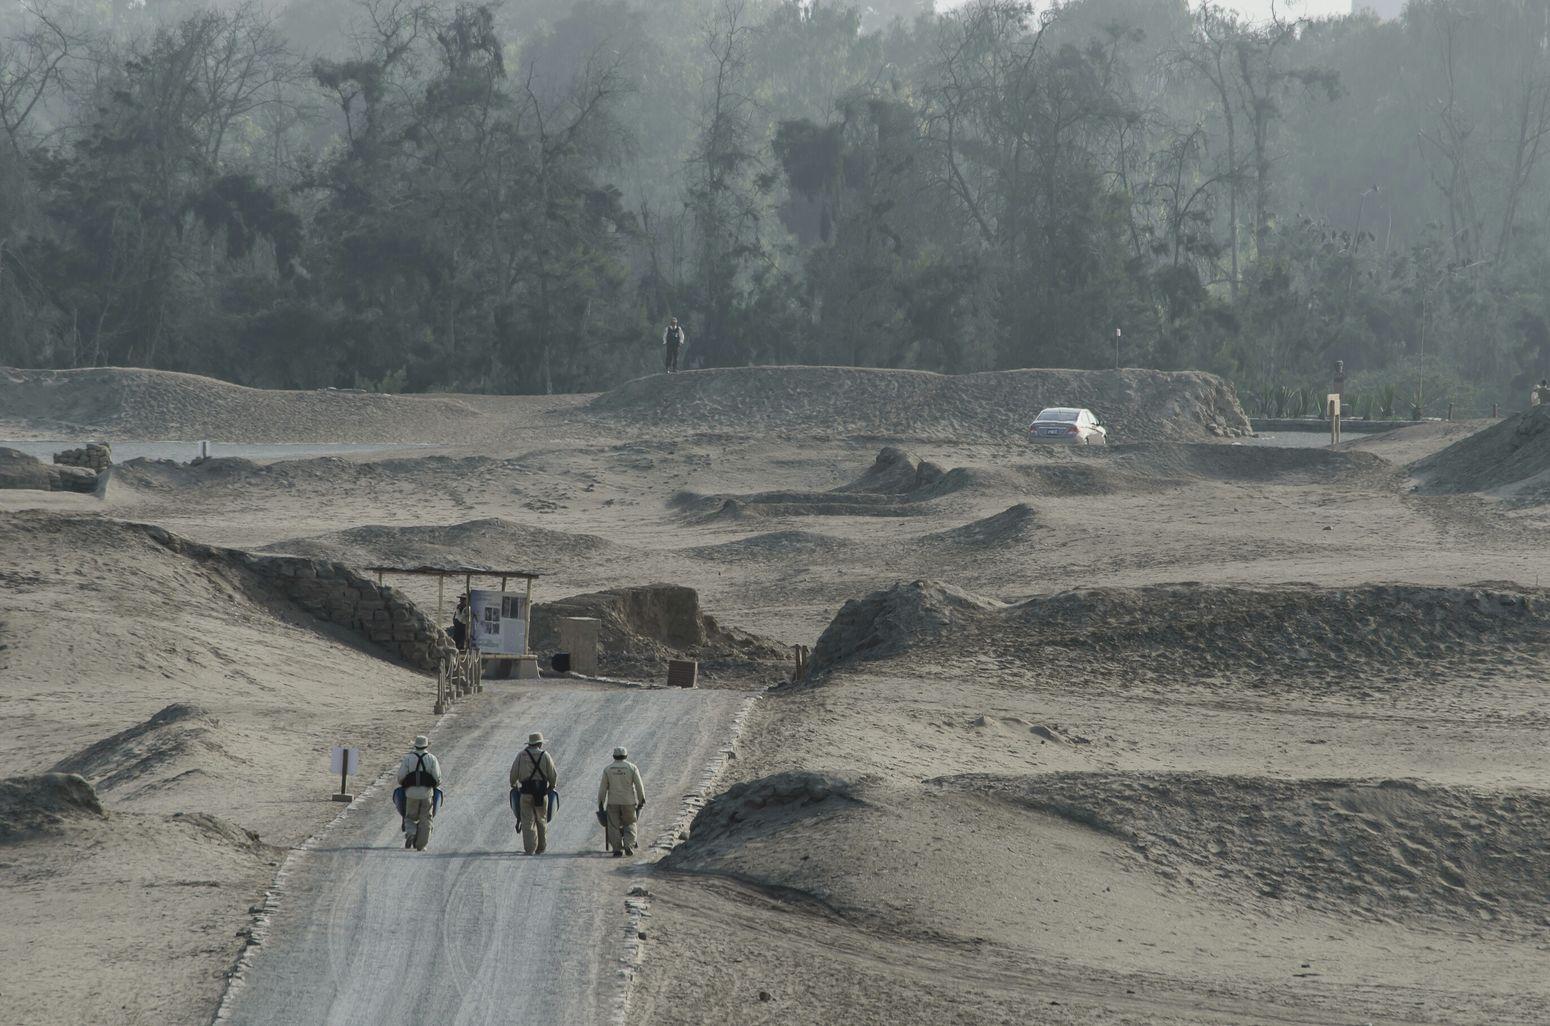 Peru Lima-Perú Lima Pachacamac Sandy Sand Desert Archaeology Archaeological Hardwork Remote Outdoors On The Road